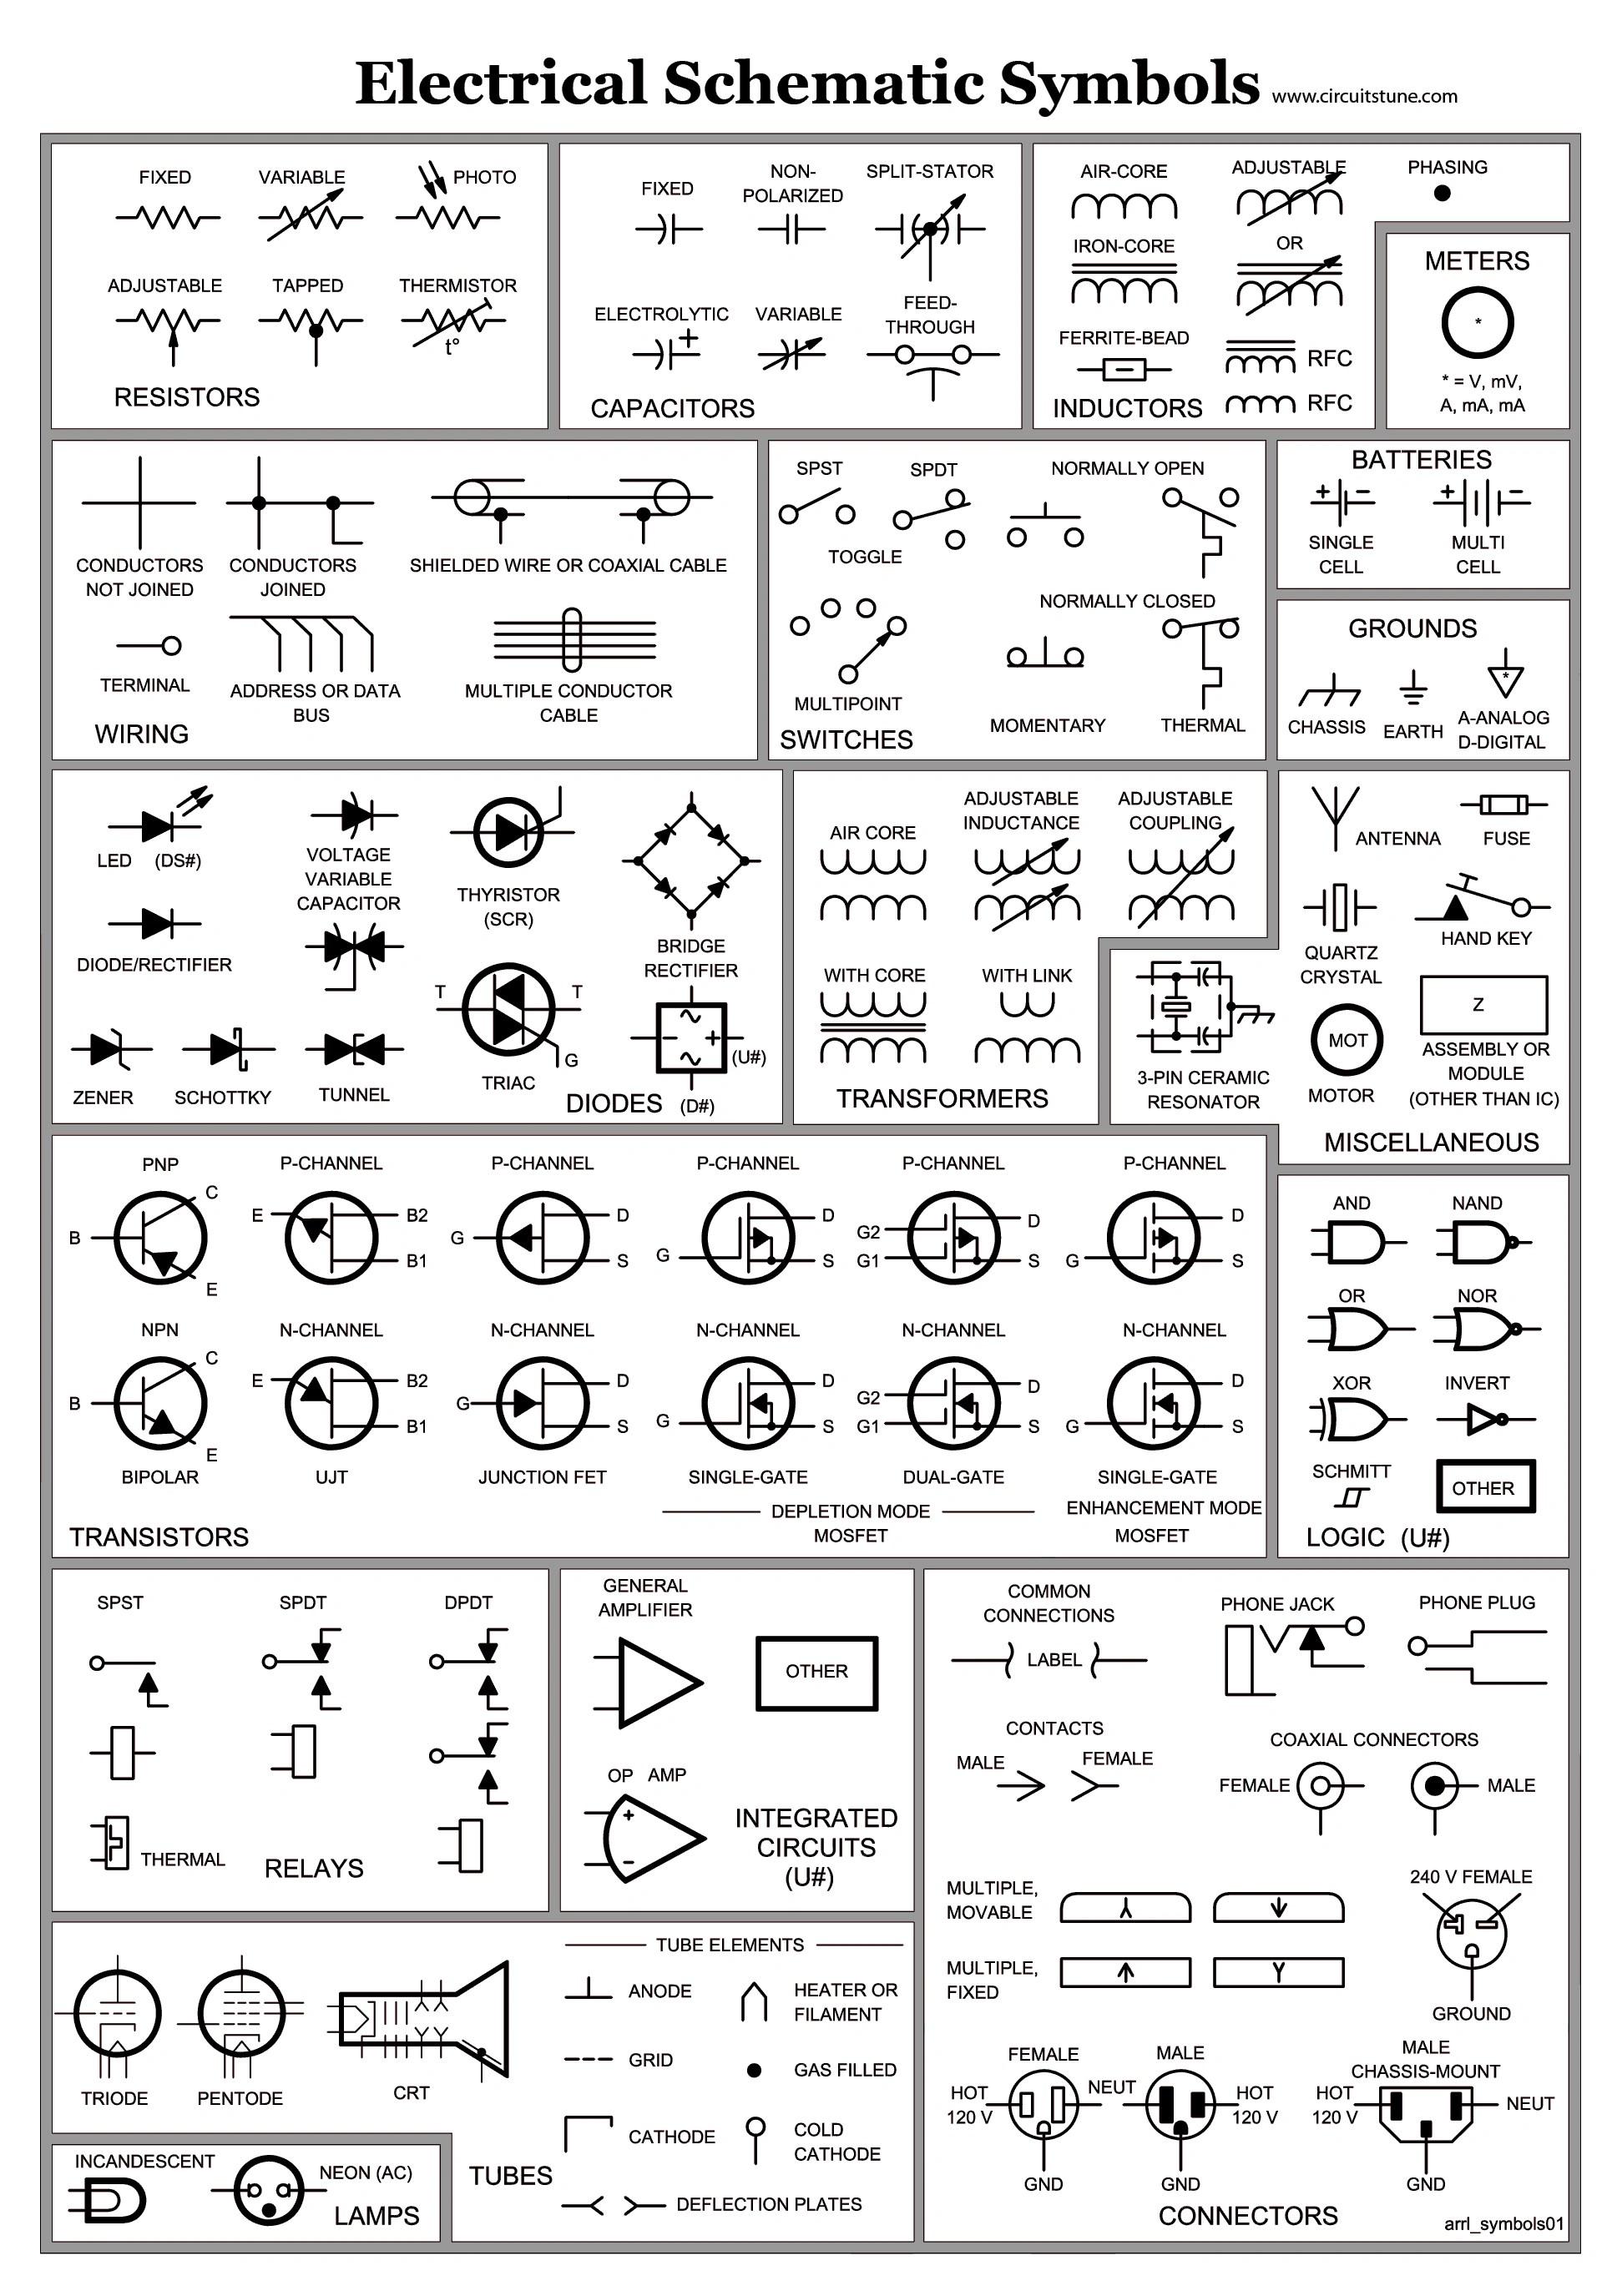 medium resolution of circuit diagram key just wiring diagram wiring diagram rj45 keystone jack circuit diagram key wiring diagram